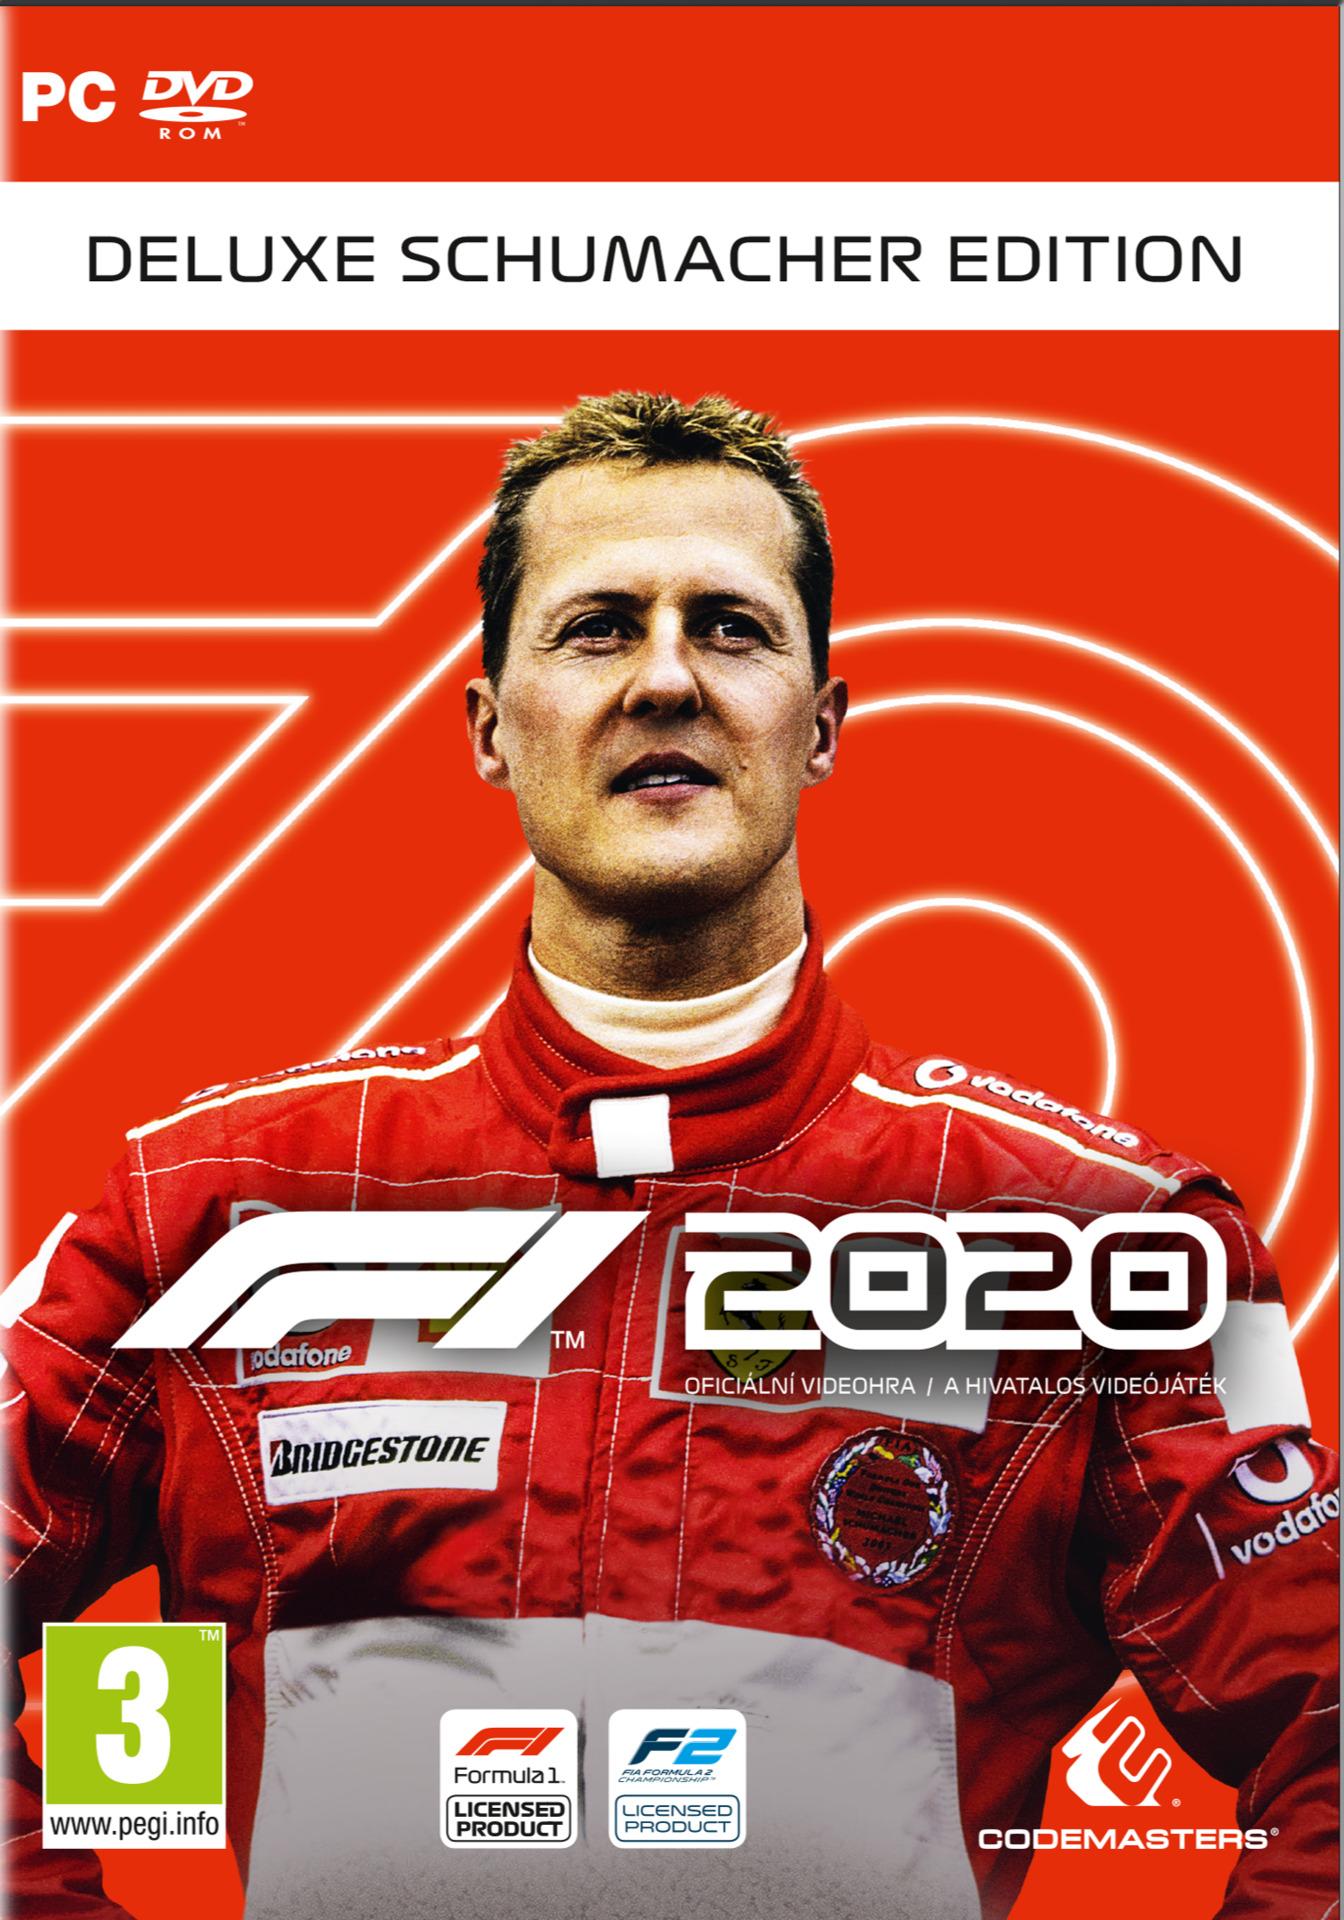 F1 2020 - Deluxe Schumacher Edition (PC)